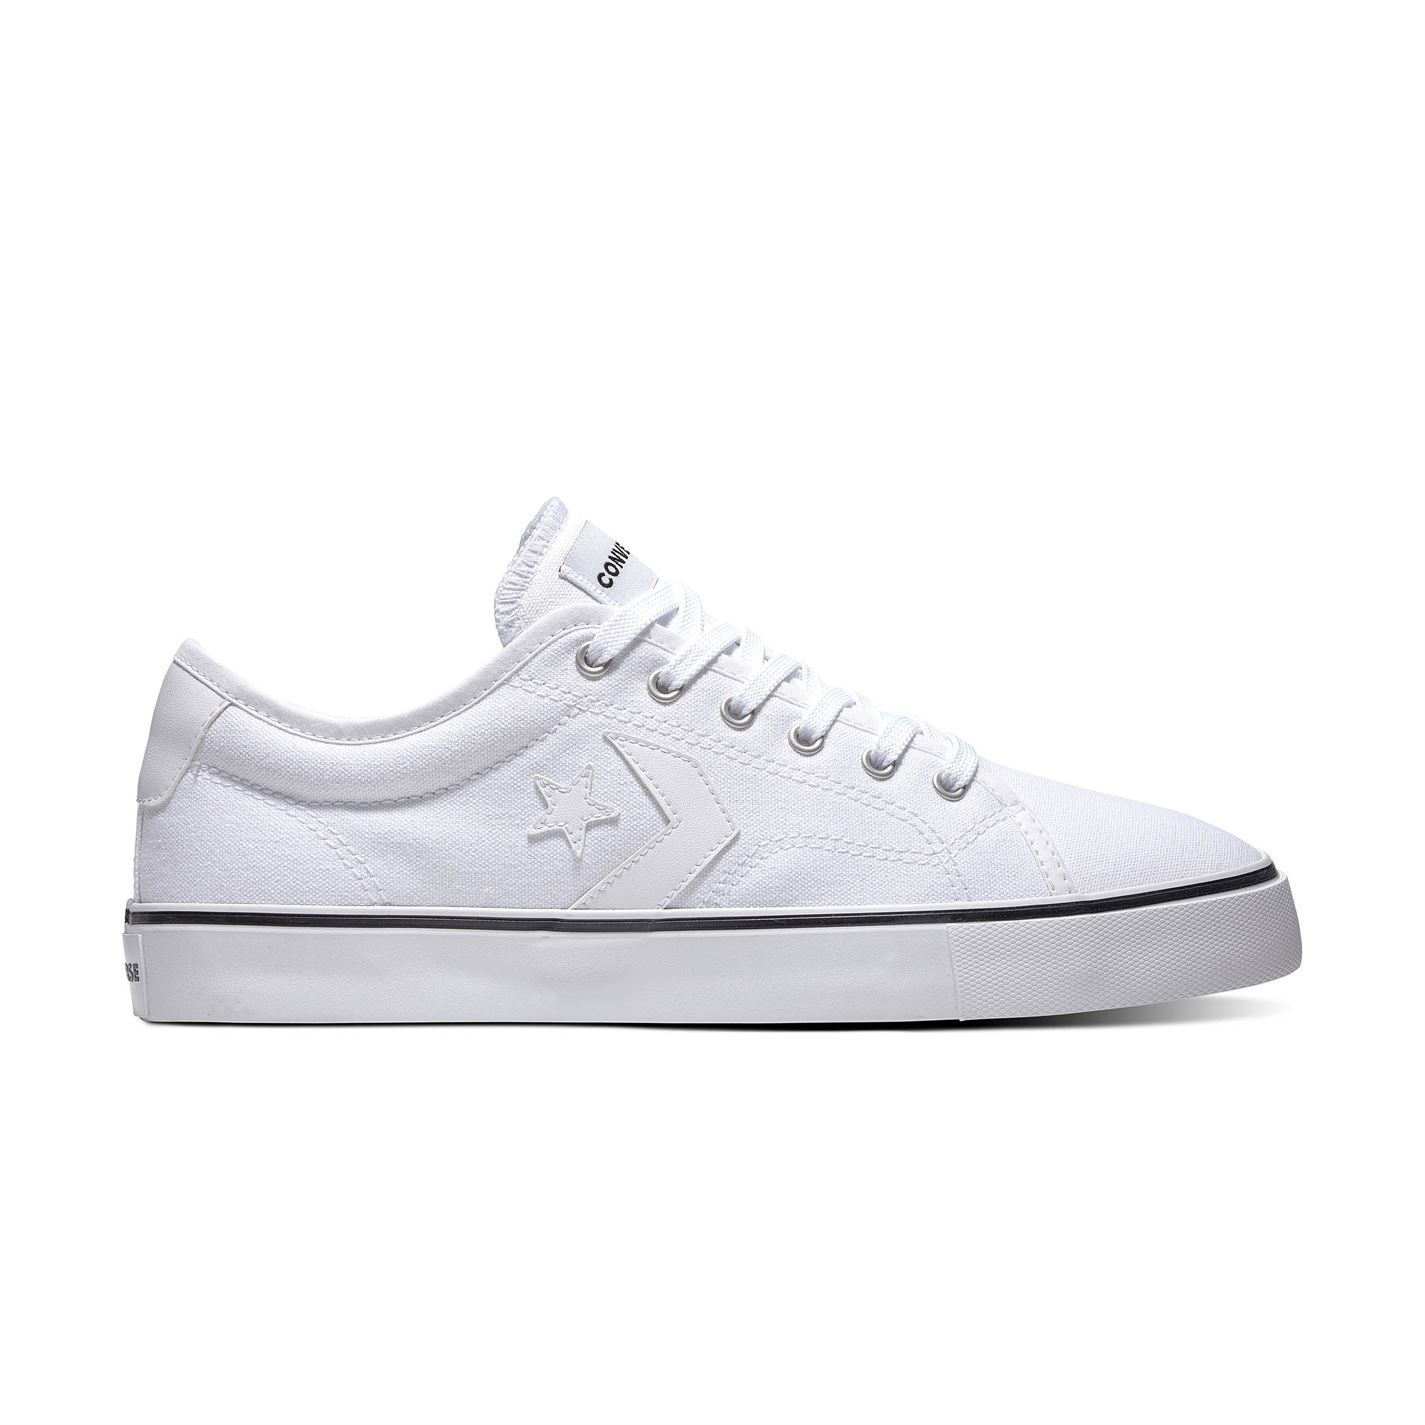 Converse-Ox-REPLAY-Baskets-Pour-Homme-Chaussures-De-Loisirs-Chaussures-Baskets miniature 28